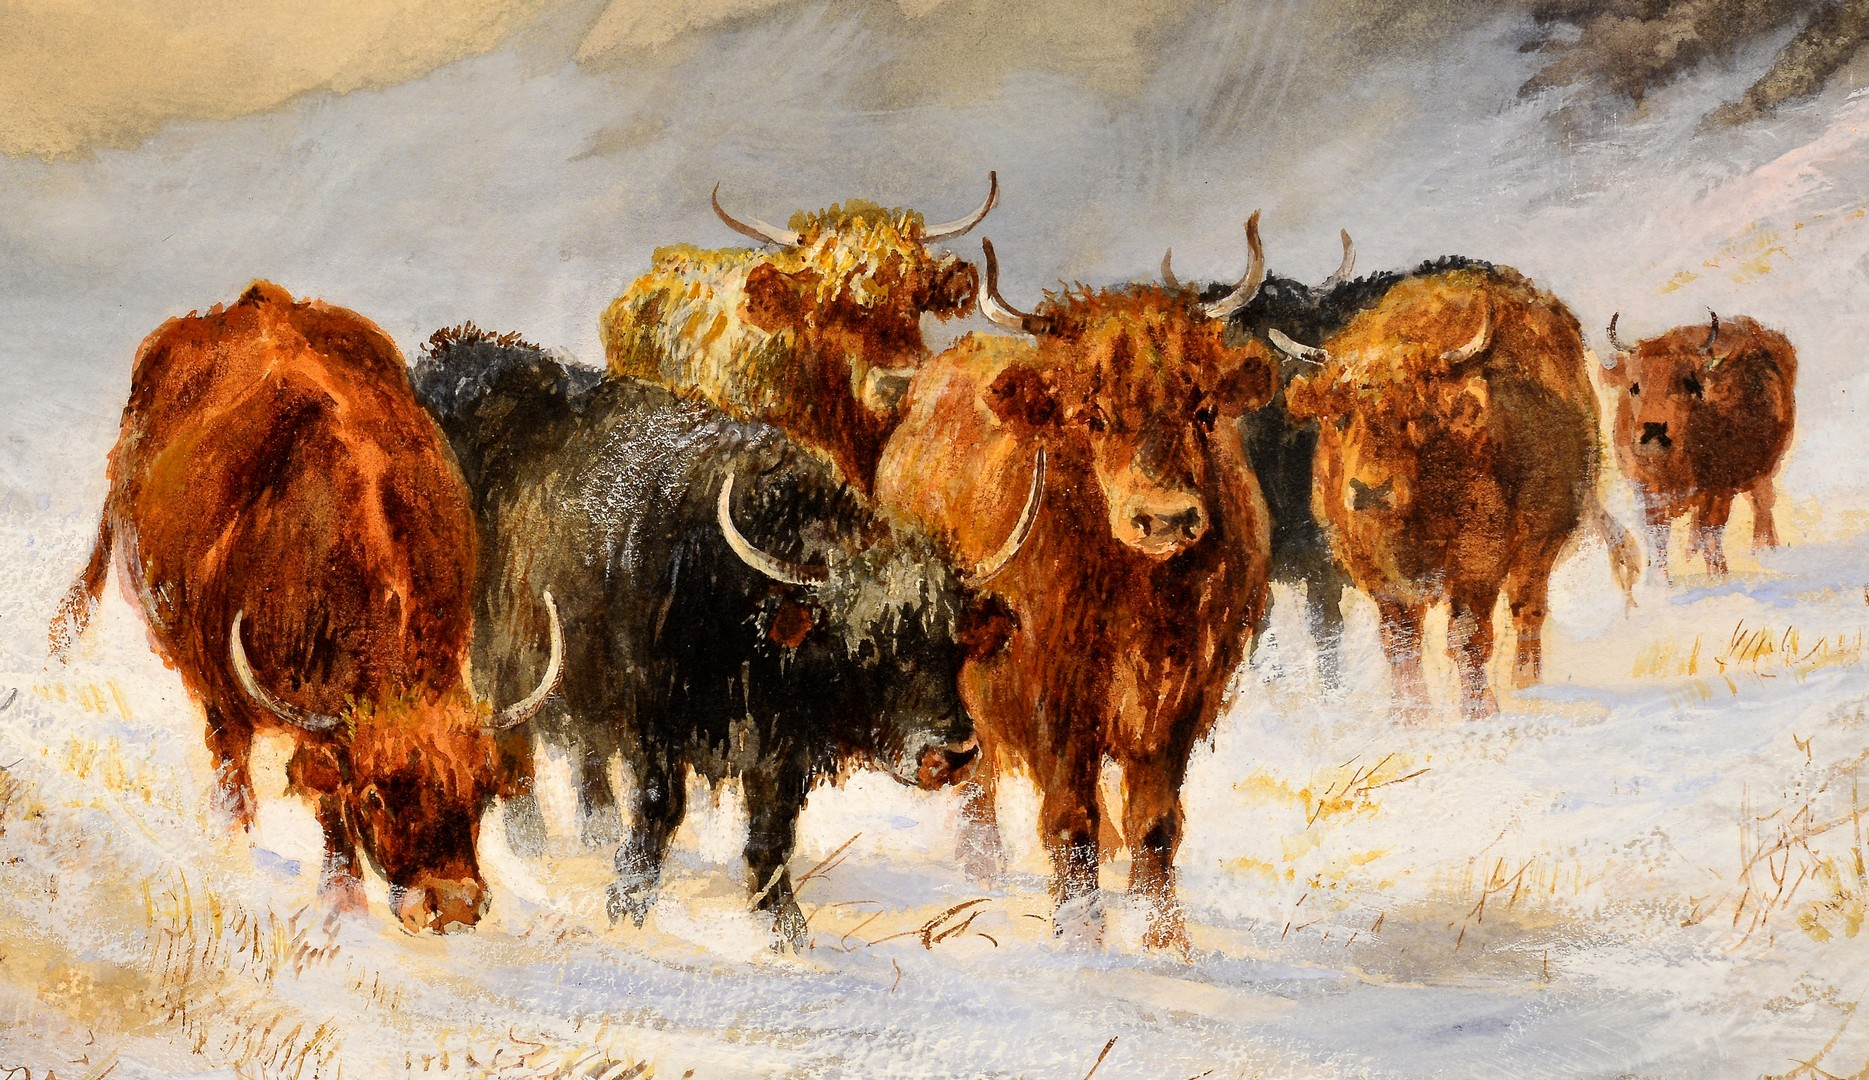 Lot 675: Stewart Forbes watercolor, Cattle in Snow